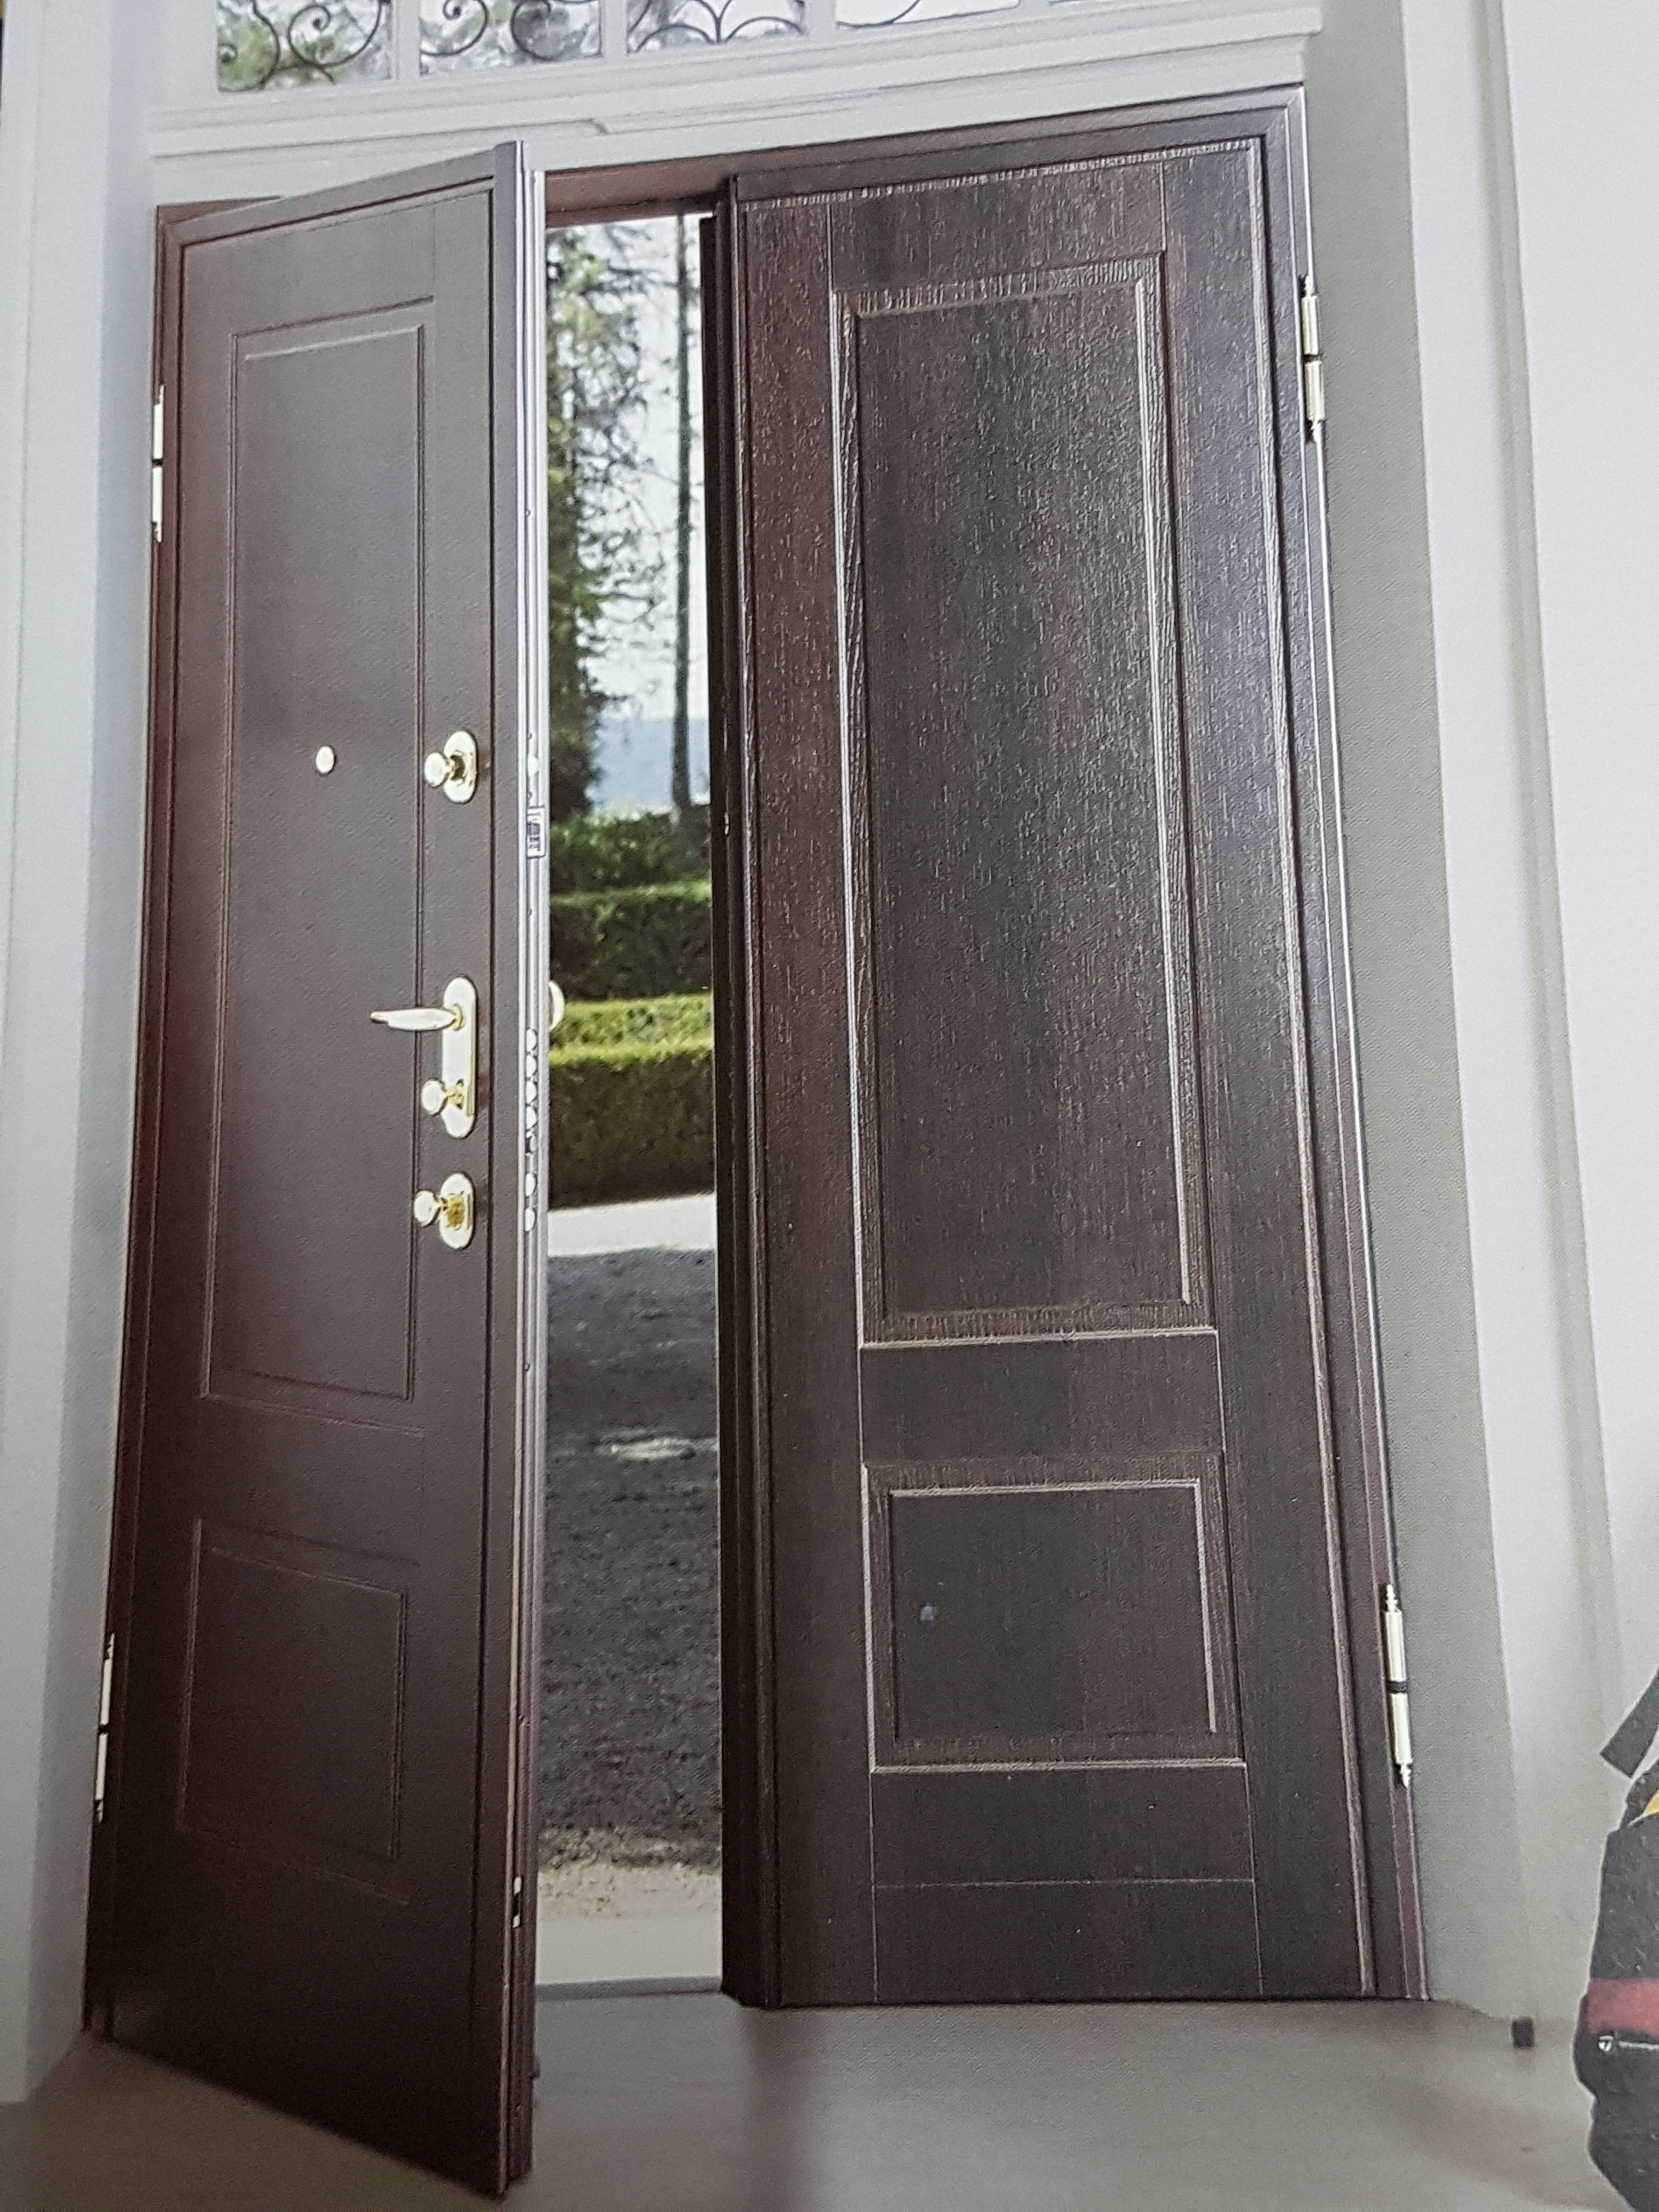 Una porta blindata aperta